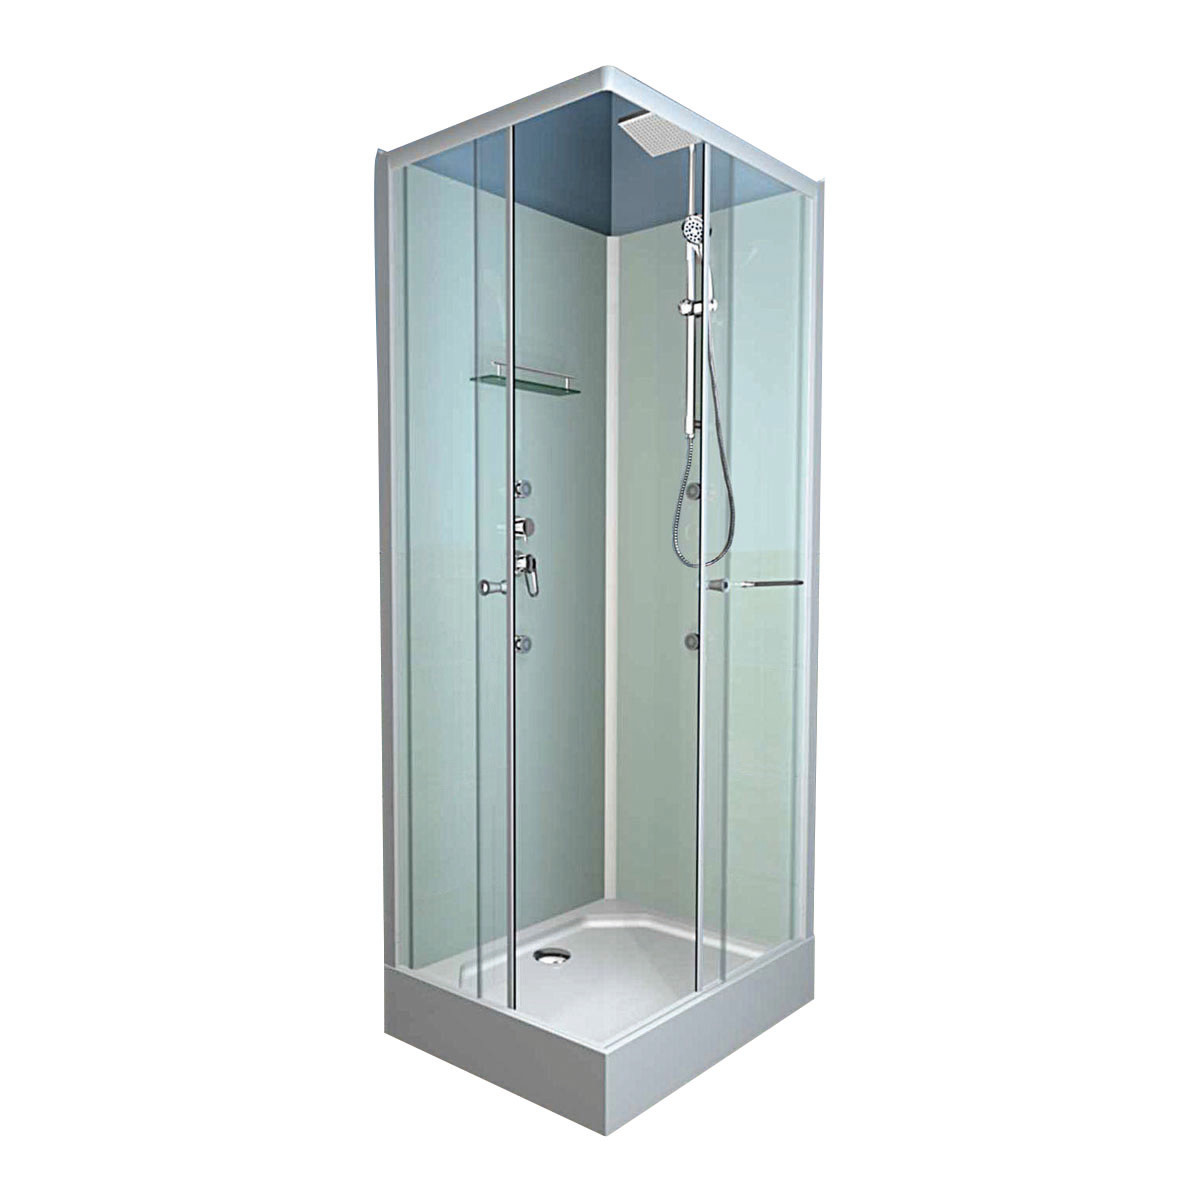 Doccia e vasca insieme 70cm for Leroy merlin piatto doccia